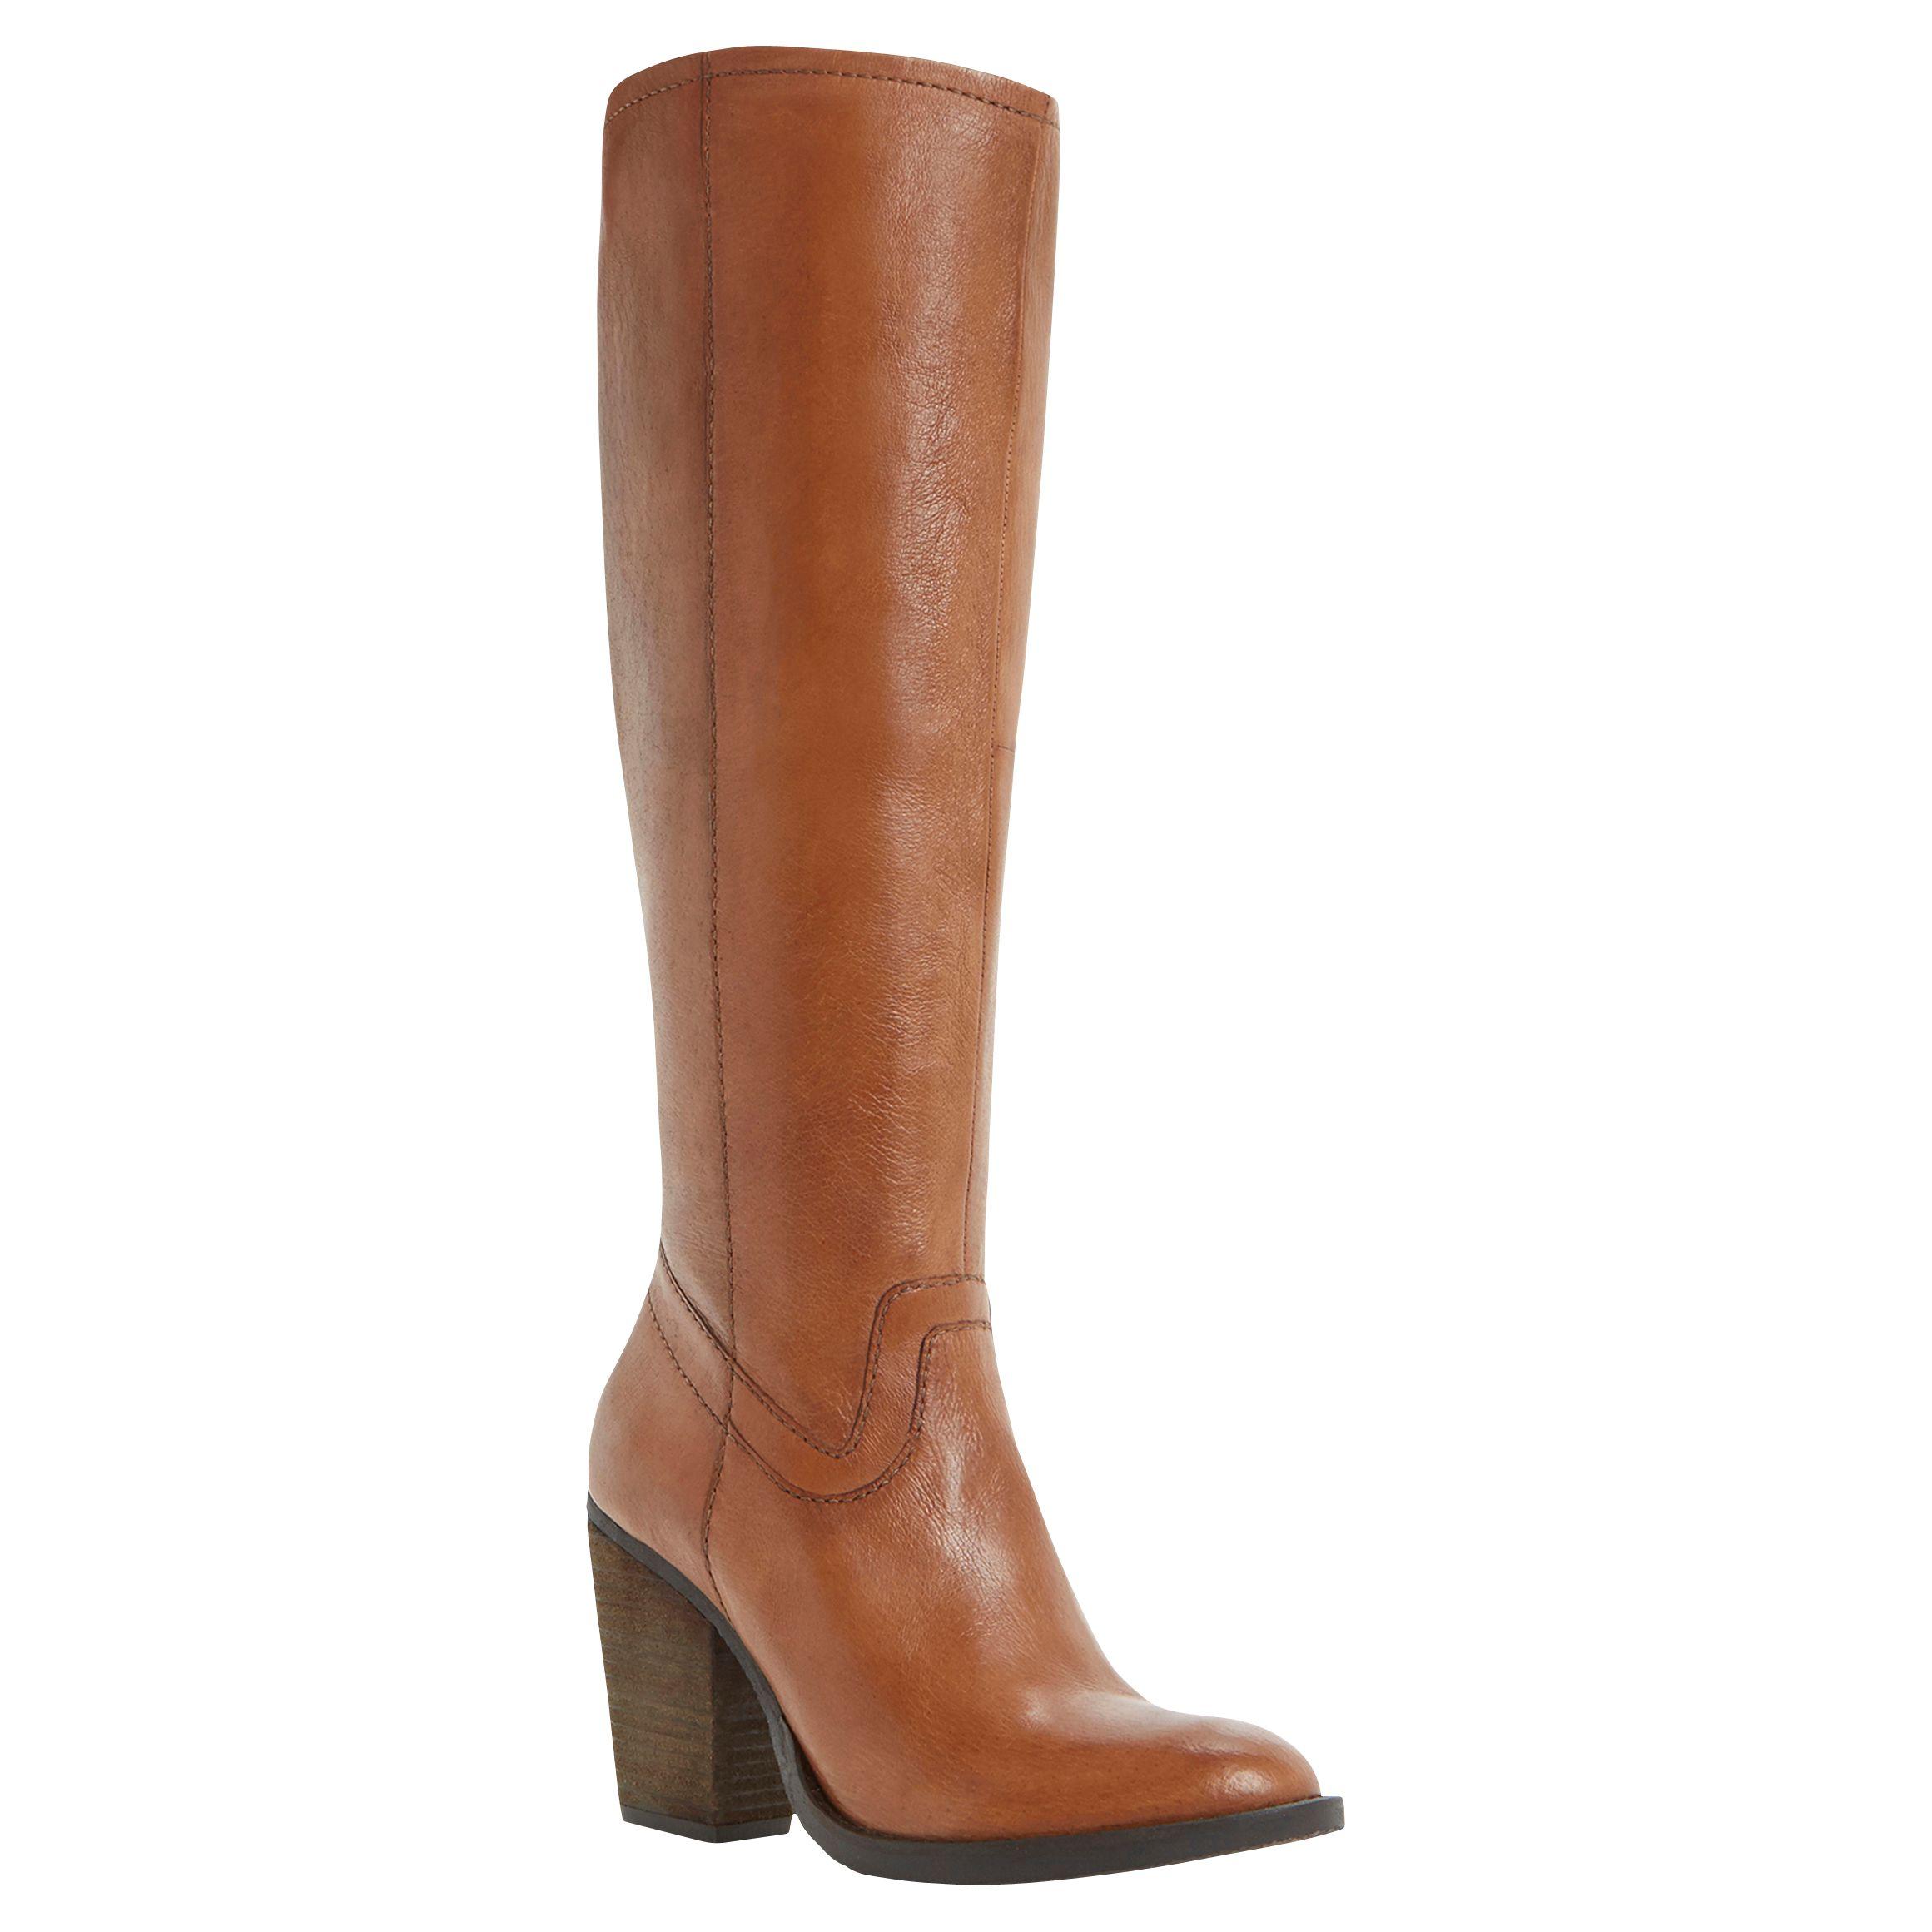 133710c259d64 Steve Madden Carter Leather Knee High Boots at John Lewis & Partners